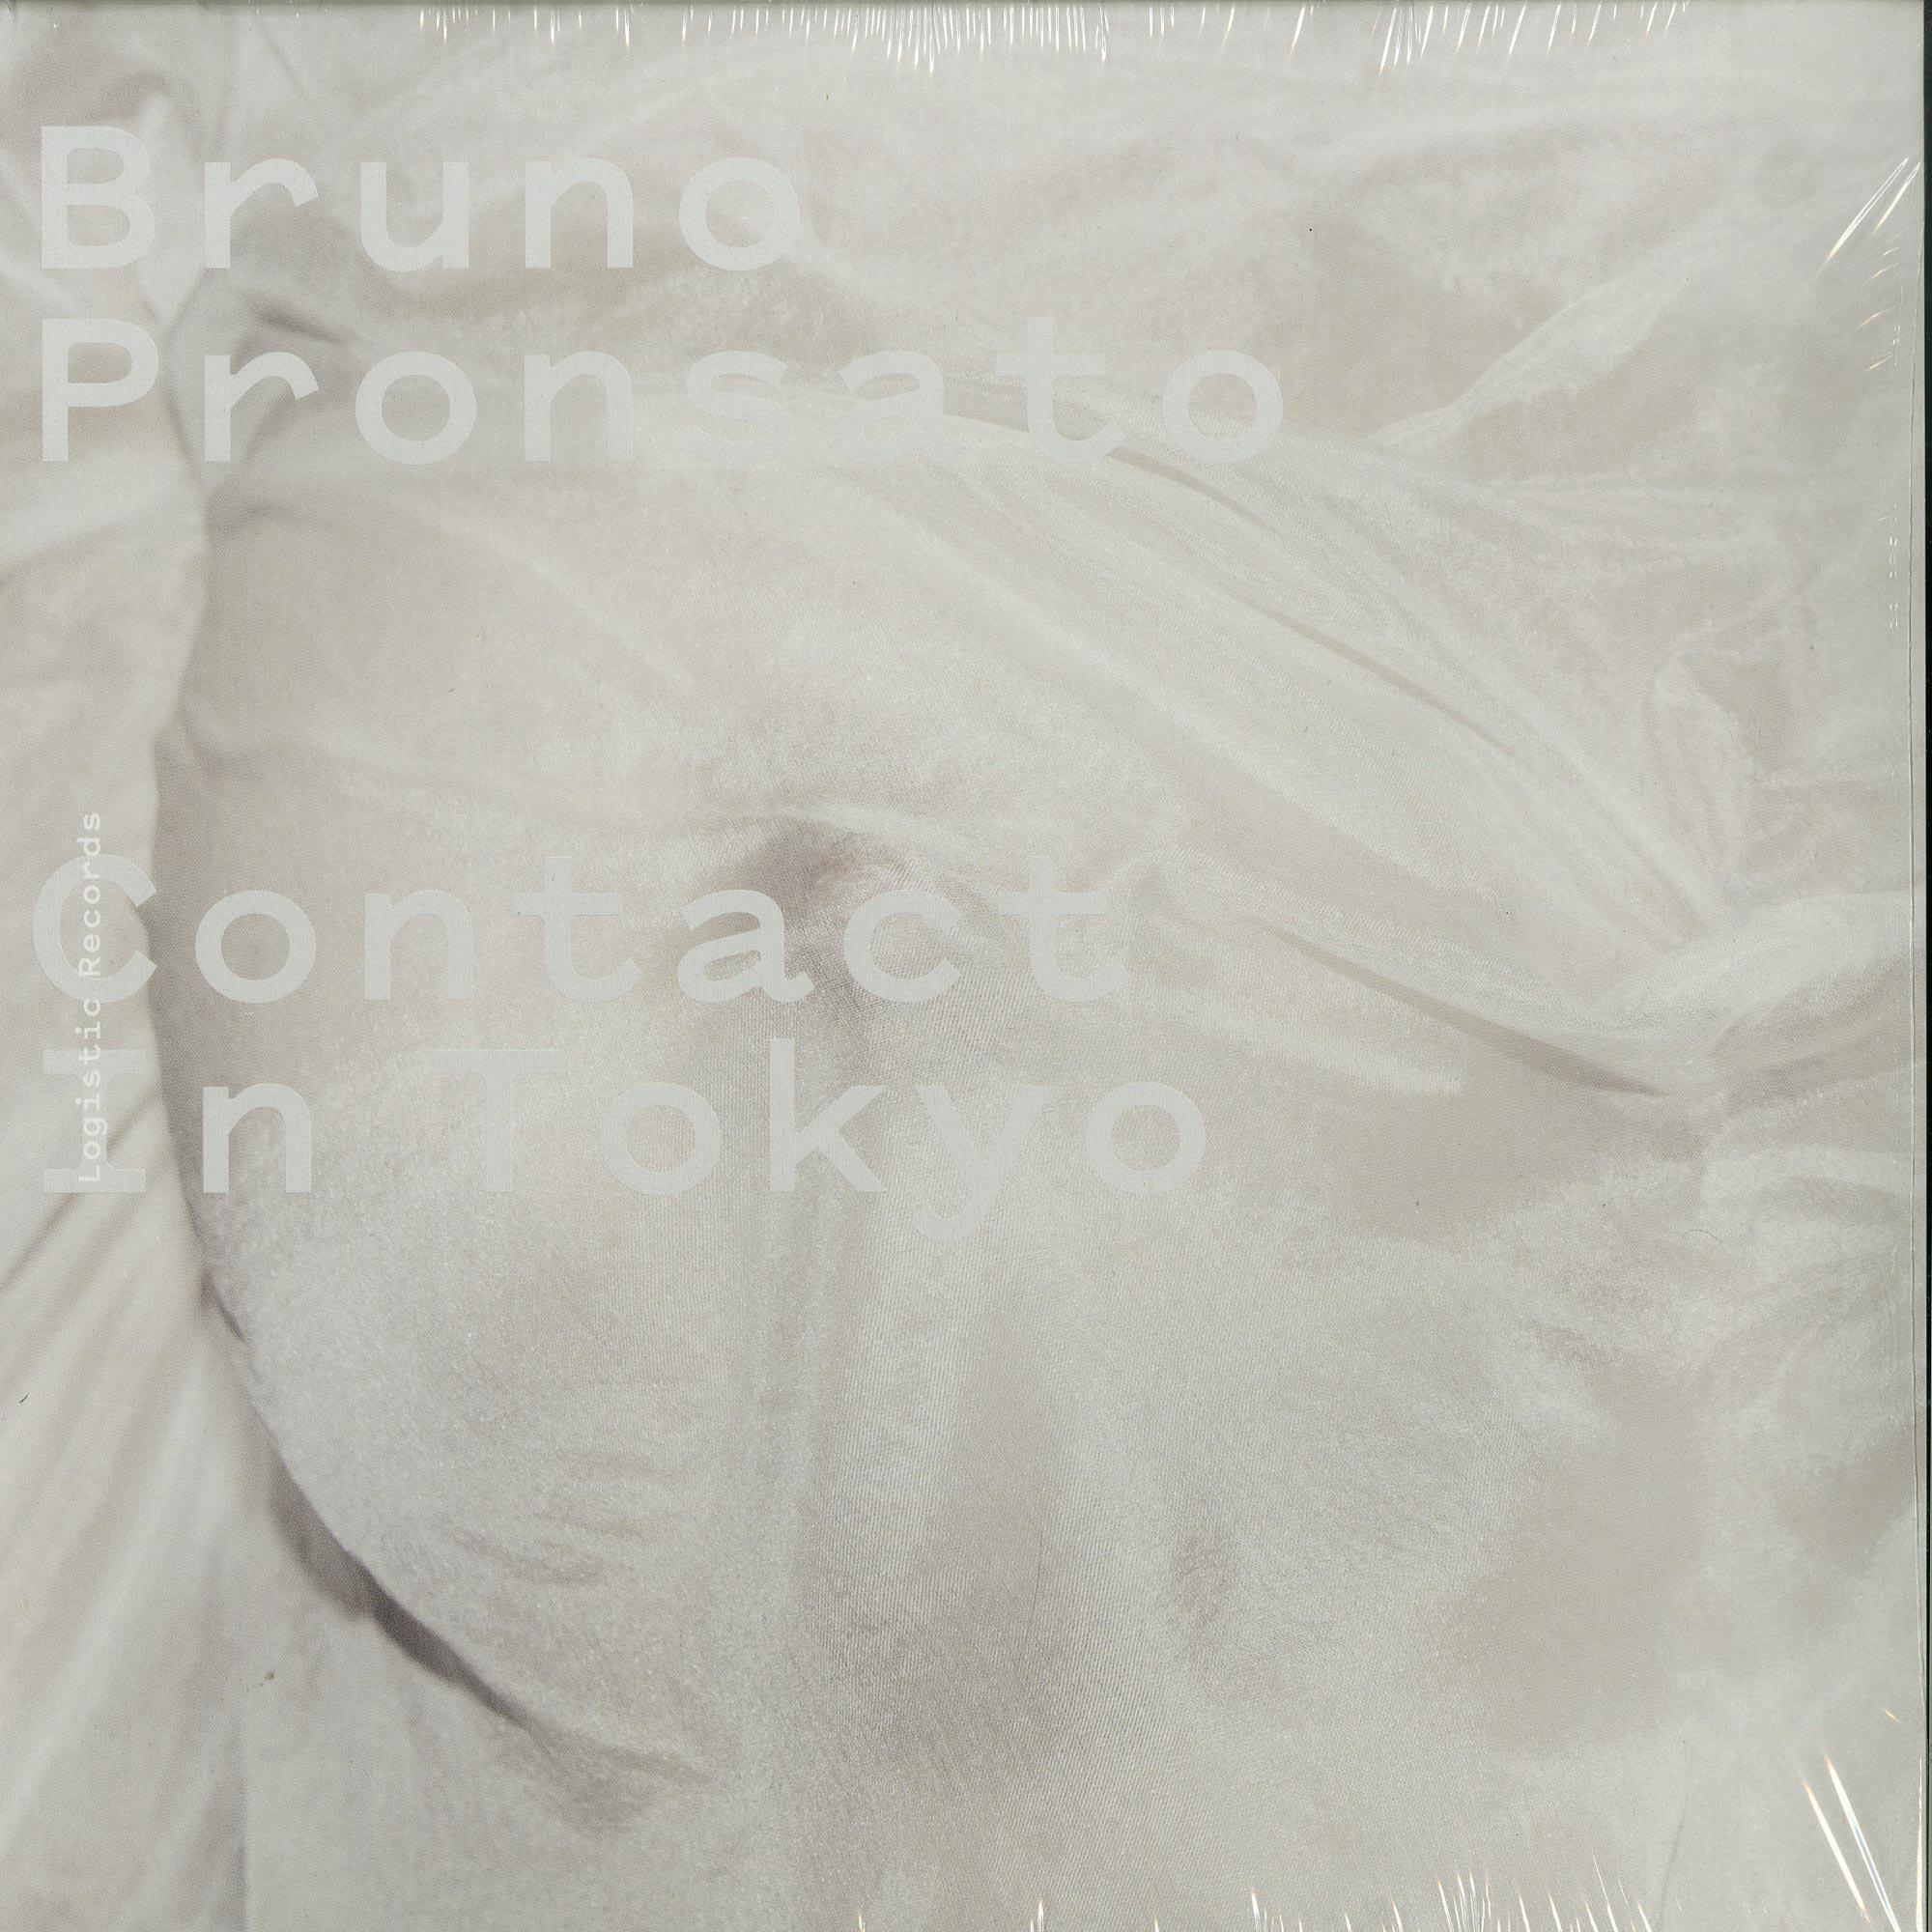 Bruno Pronsato - CONTACT IN TOKYO